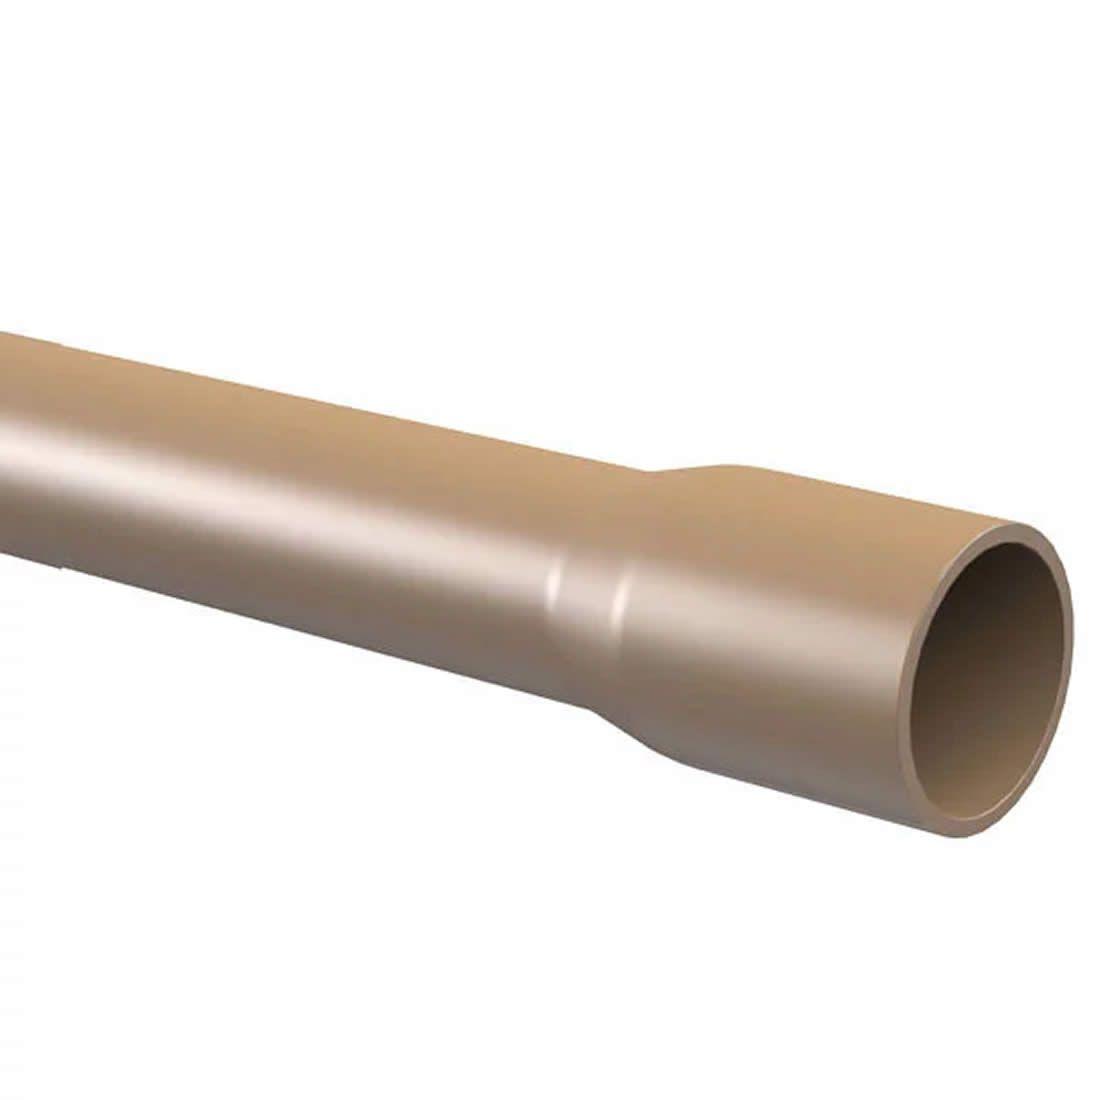 Tubo PVC Soldável 85mm X 6 Metros Tigre